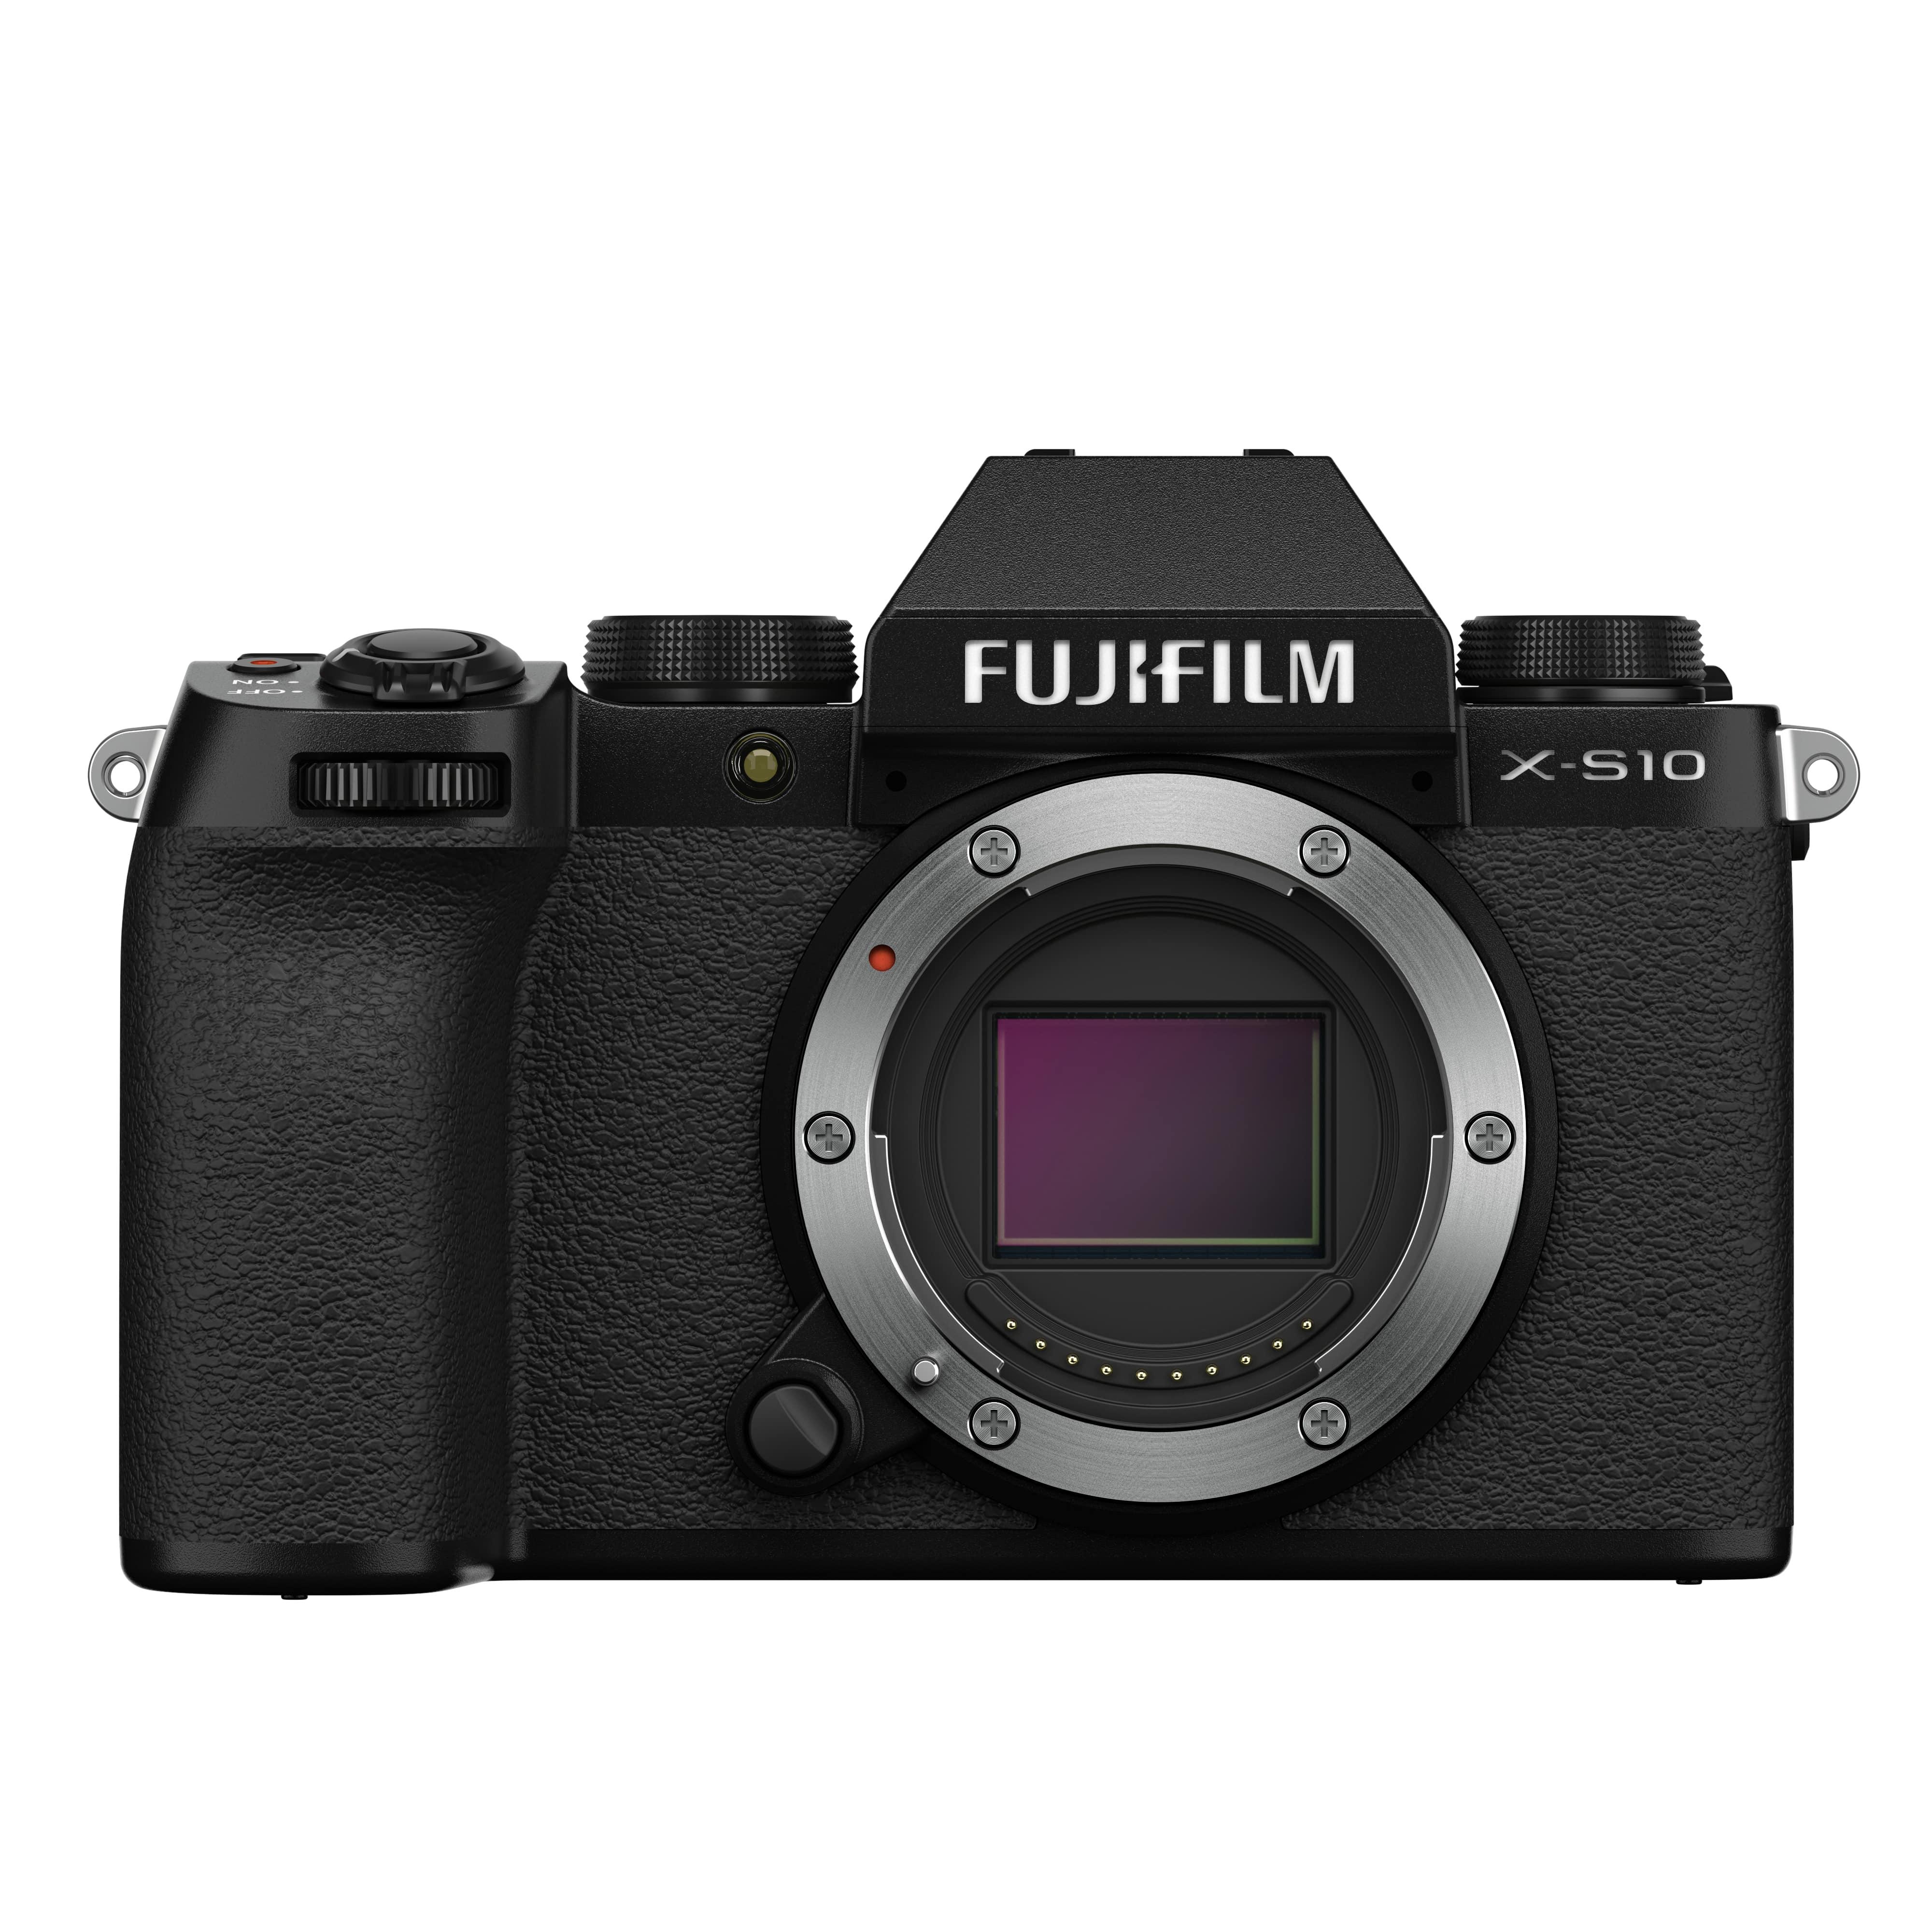 Vienna Camera Osteraktion: z.B. Fujifilm X-S10 // Sigma 14-24mm F2.8 DG DN Art Objektiv Sony E-Mount für 1304,10€ (exkl. 50€ Cashback)